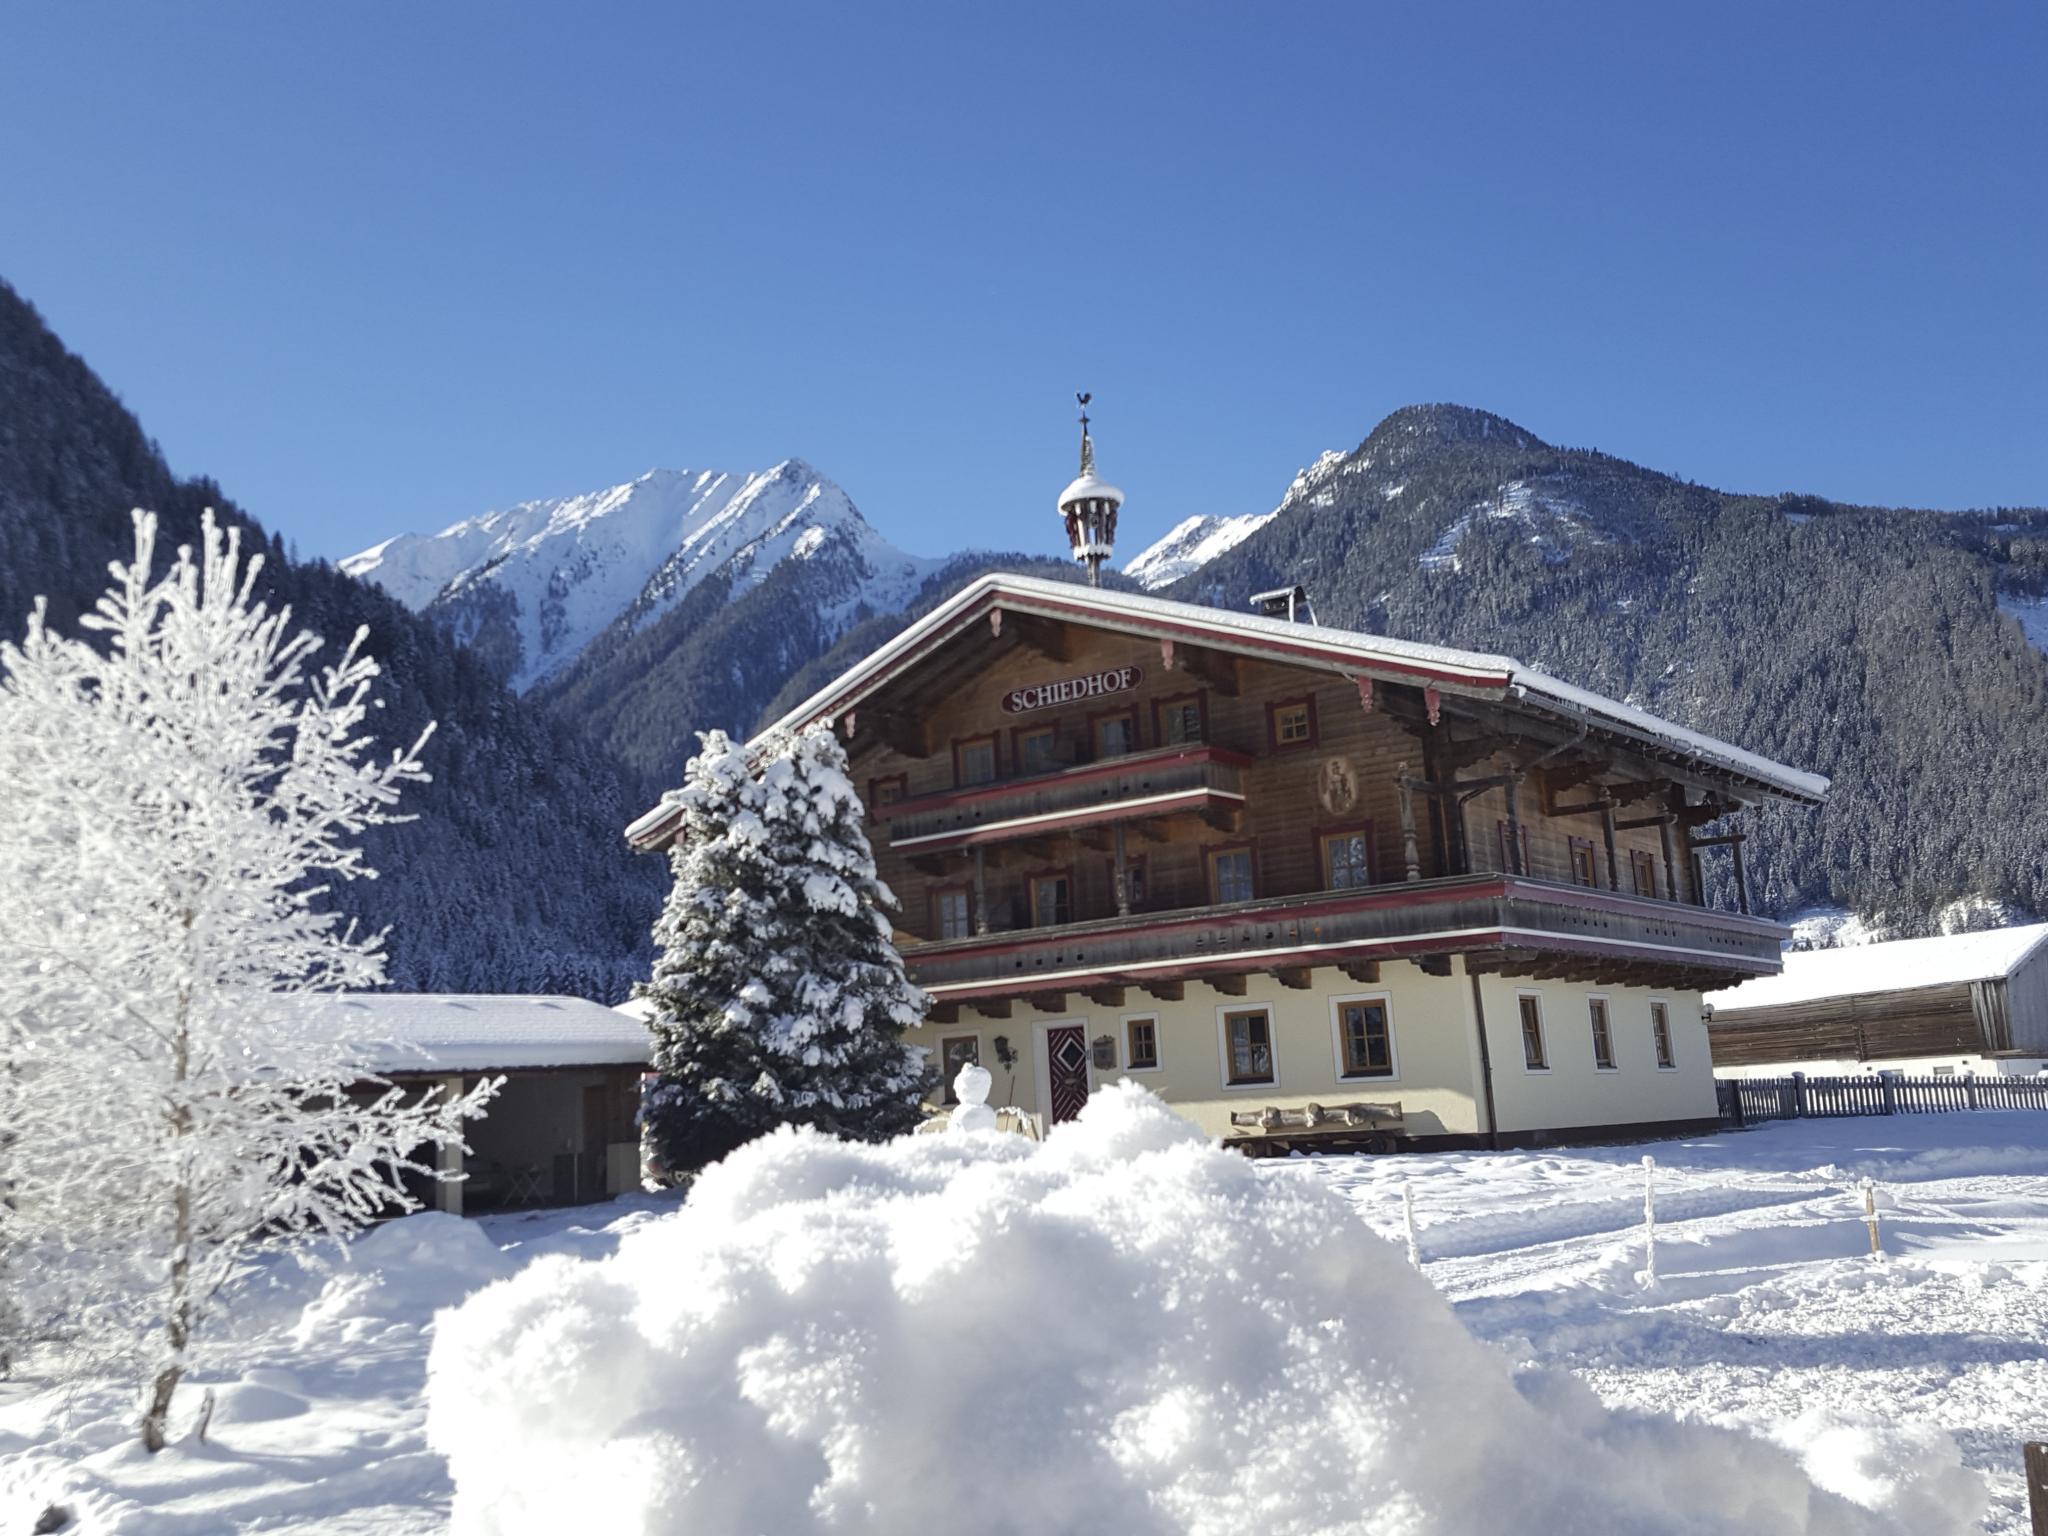 Landhaus Schiedhof Salzburgerland